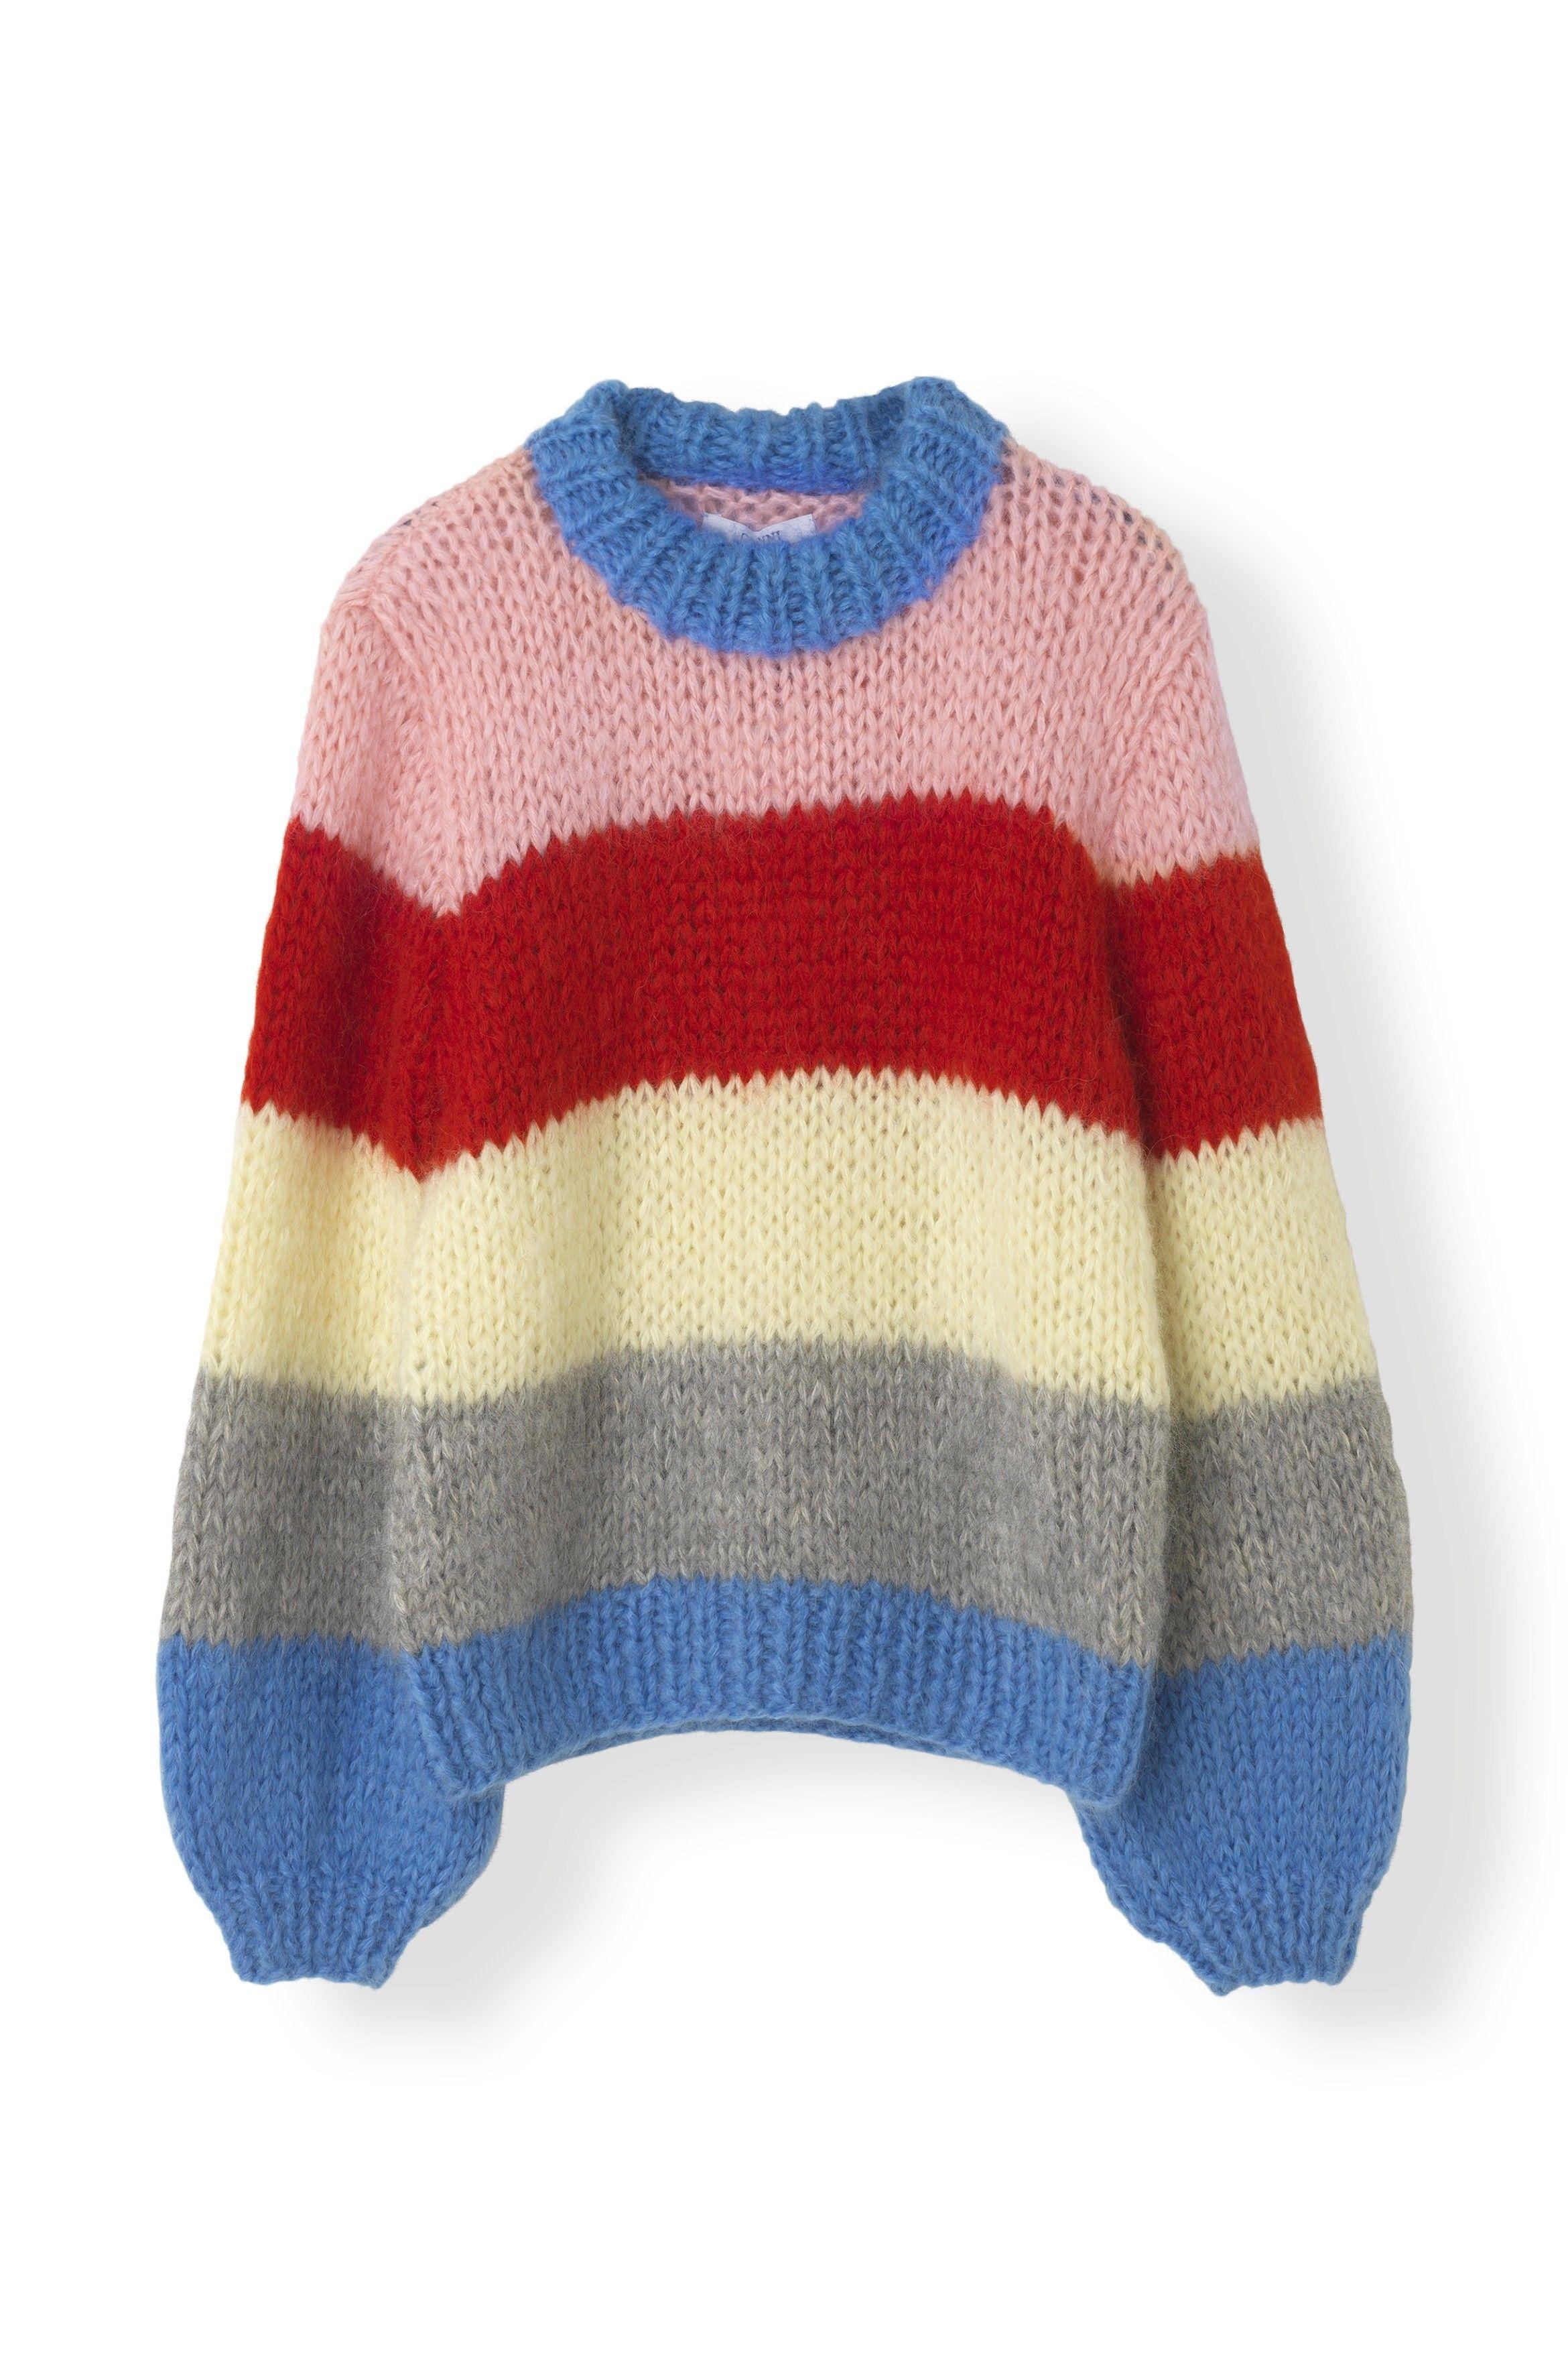 9e3ac96ba Ganni The Julliard Mohair Knit, K1067 Block Colour | strik ...